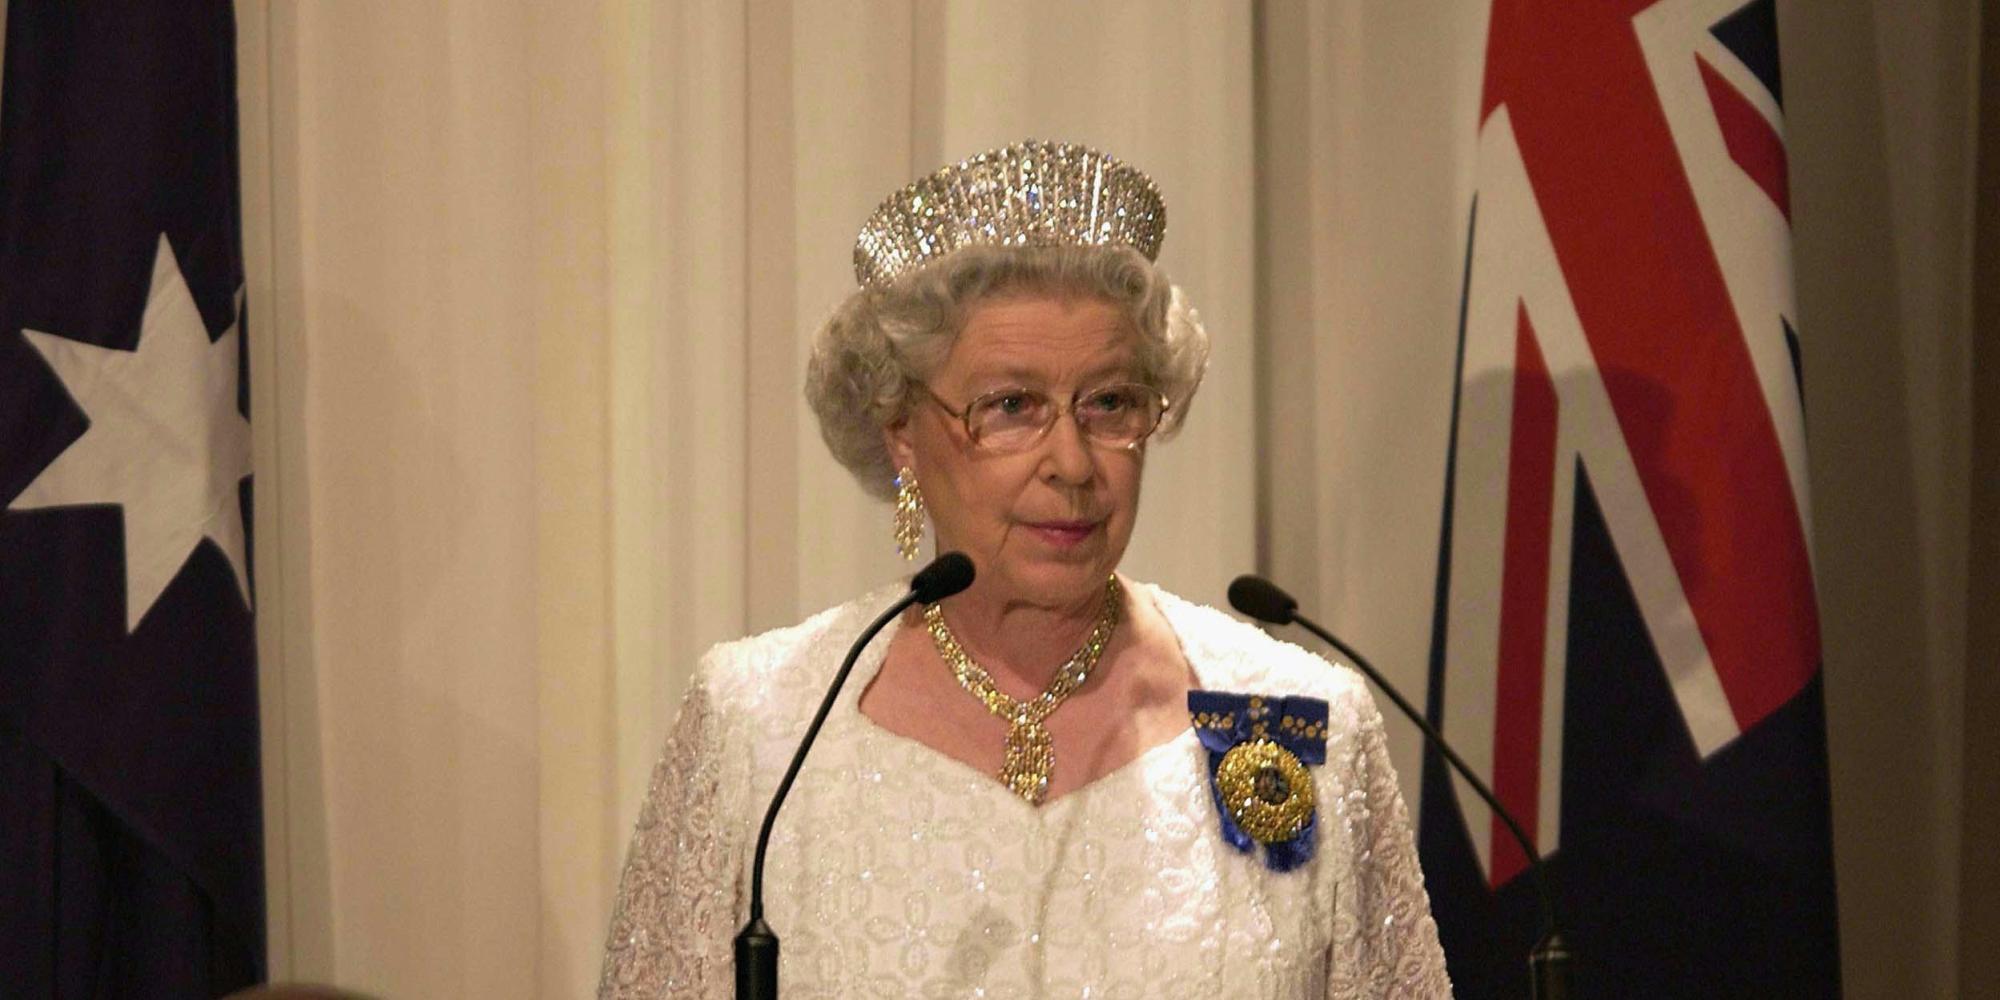 Regina elisabetta ii sventato un attentato contro la for La regina elisabetta 2